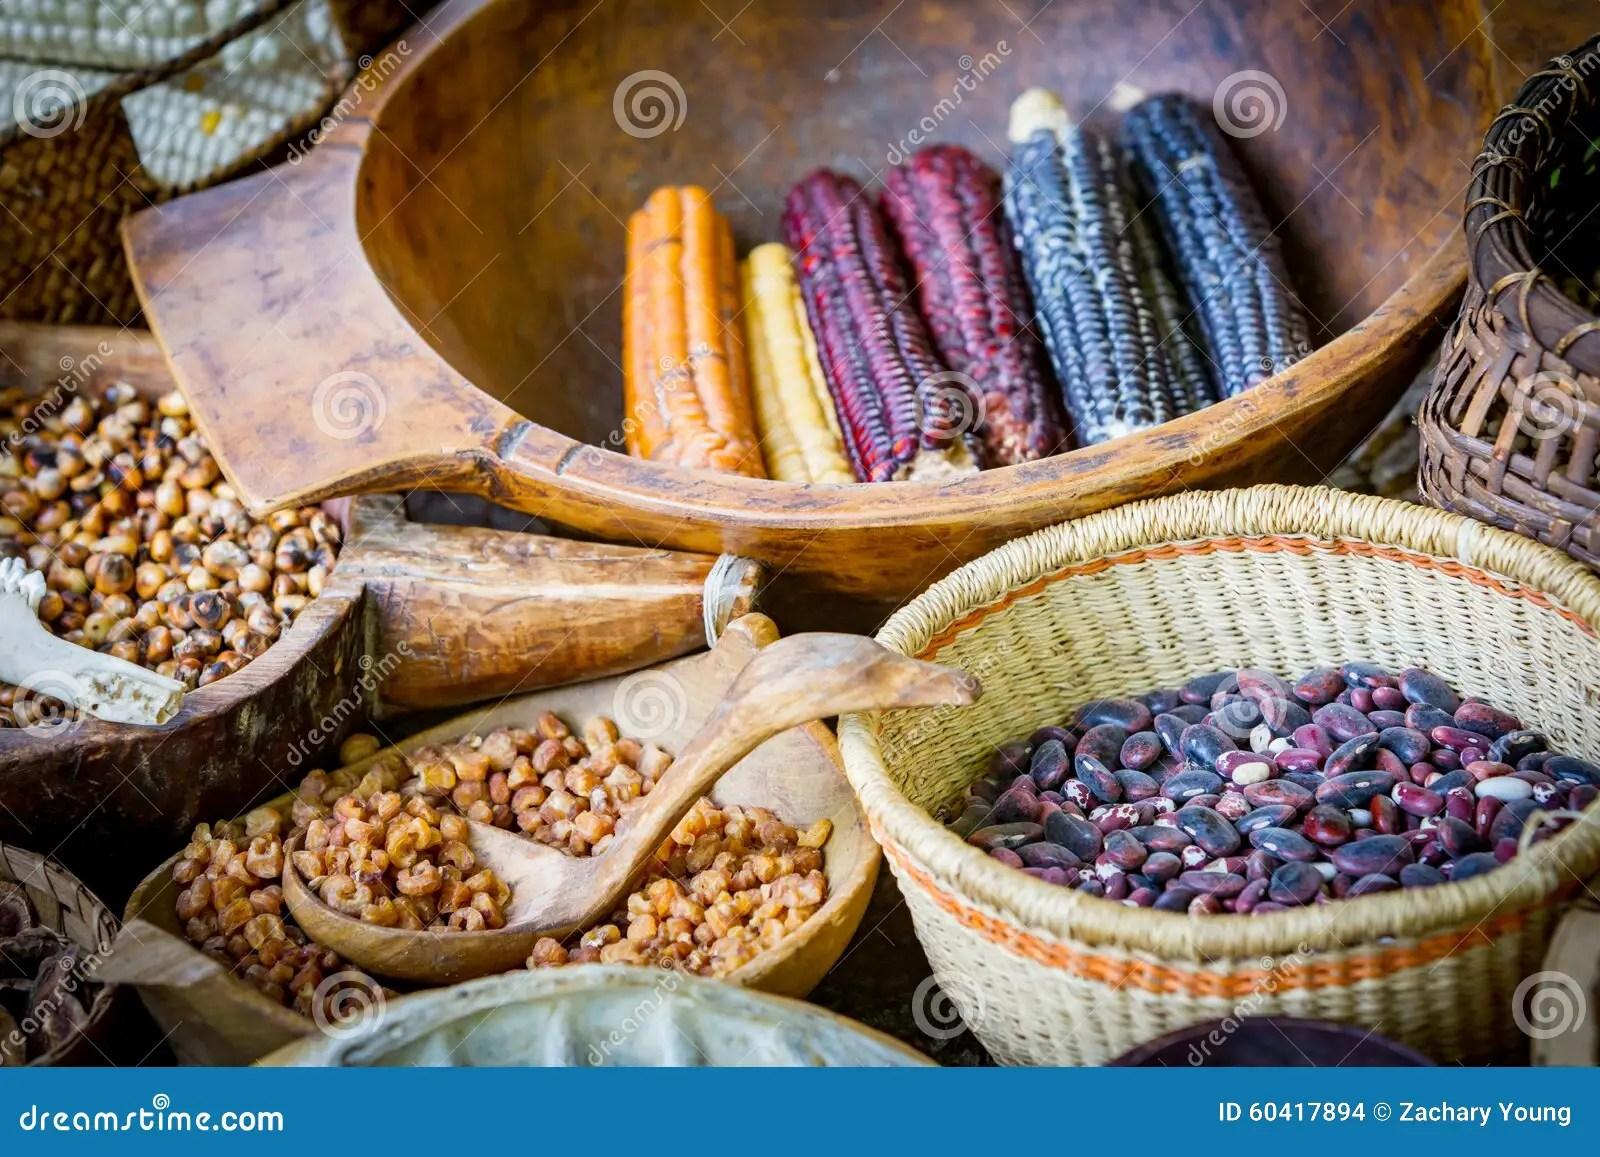 Native American Food Market Stock Photo